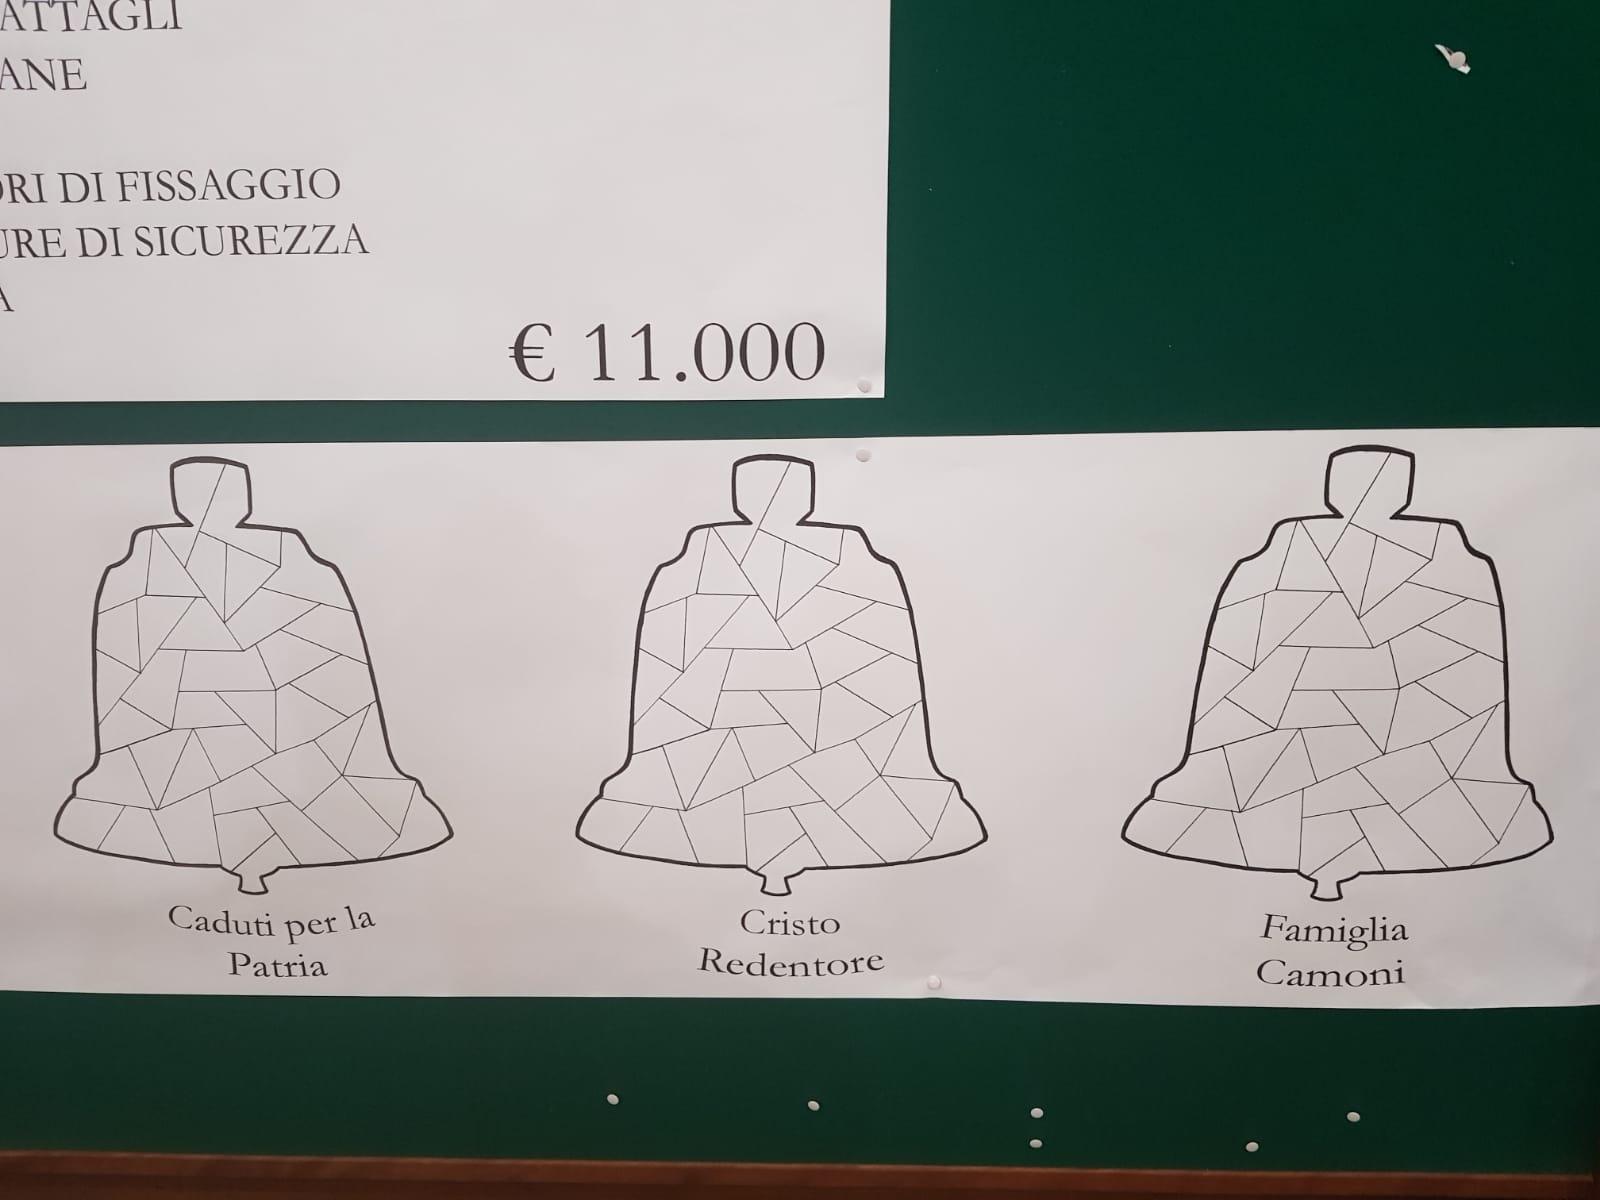 Cartellone campane (3)